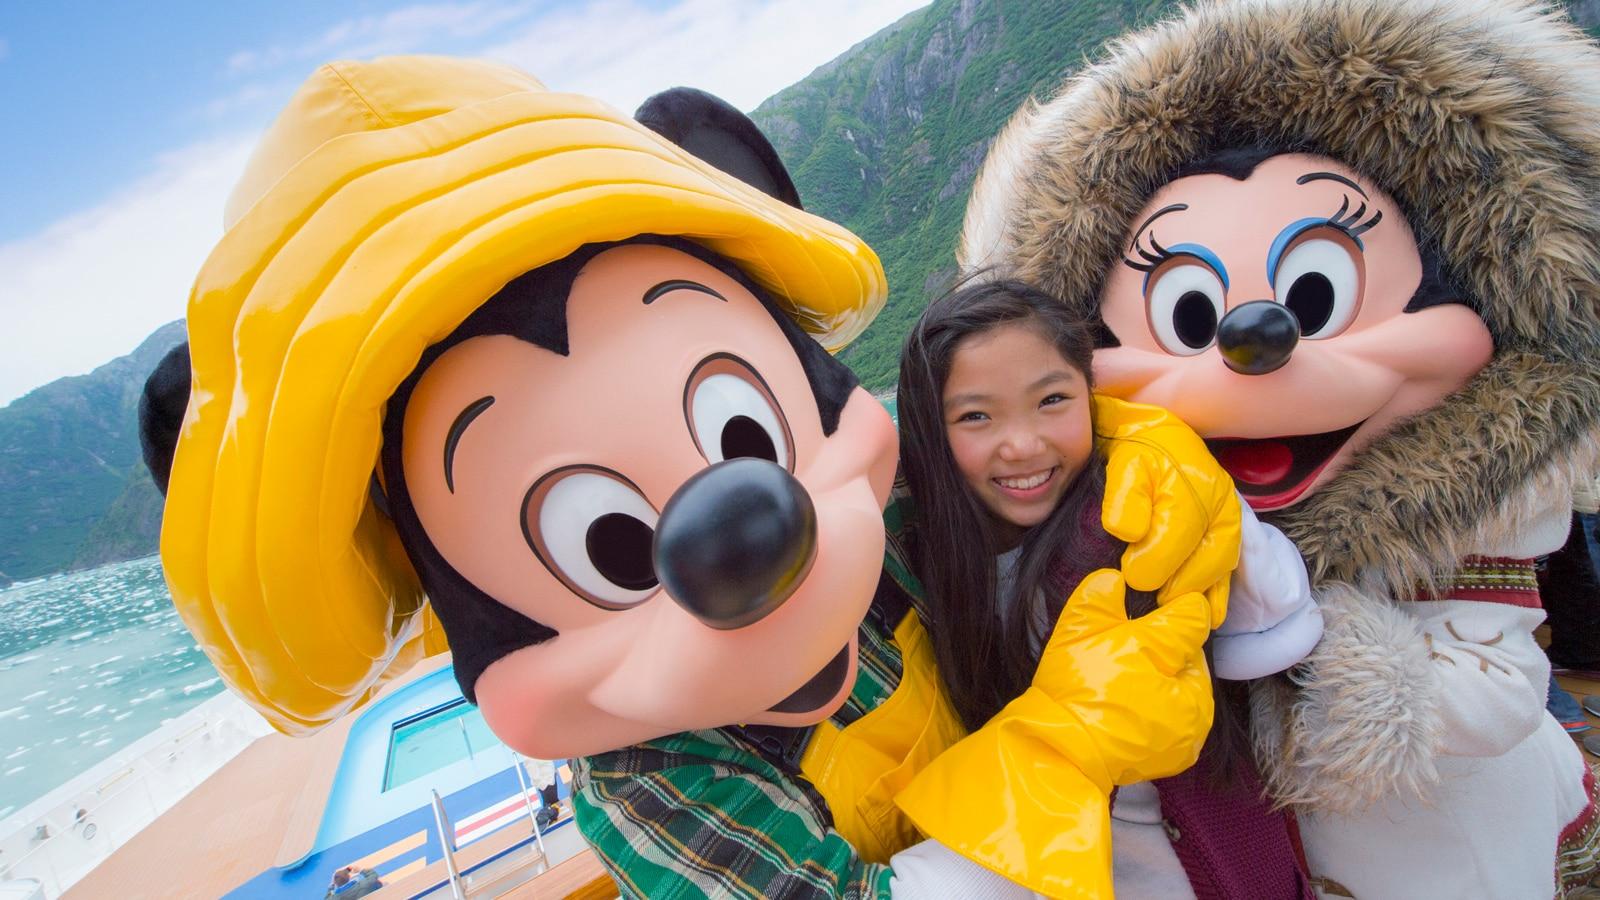 Vacation Ideas In August 2020 2020 Disney Vacation Club Member Cruise: 7 Night Alaska   Disney